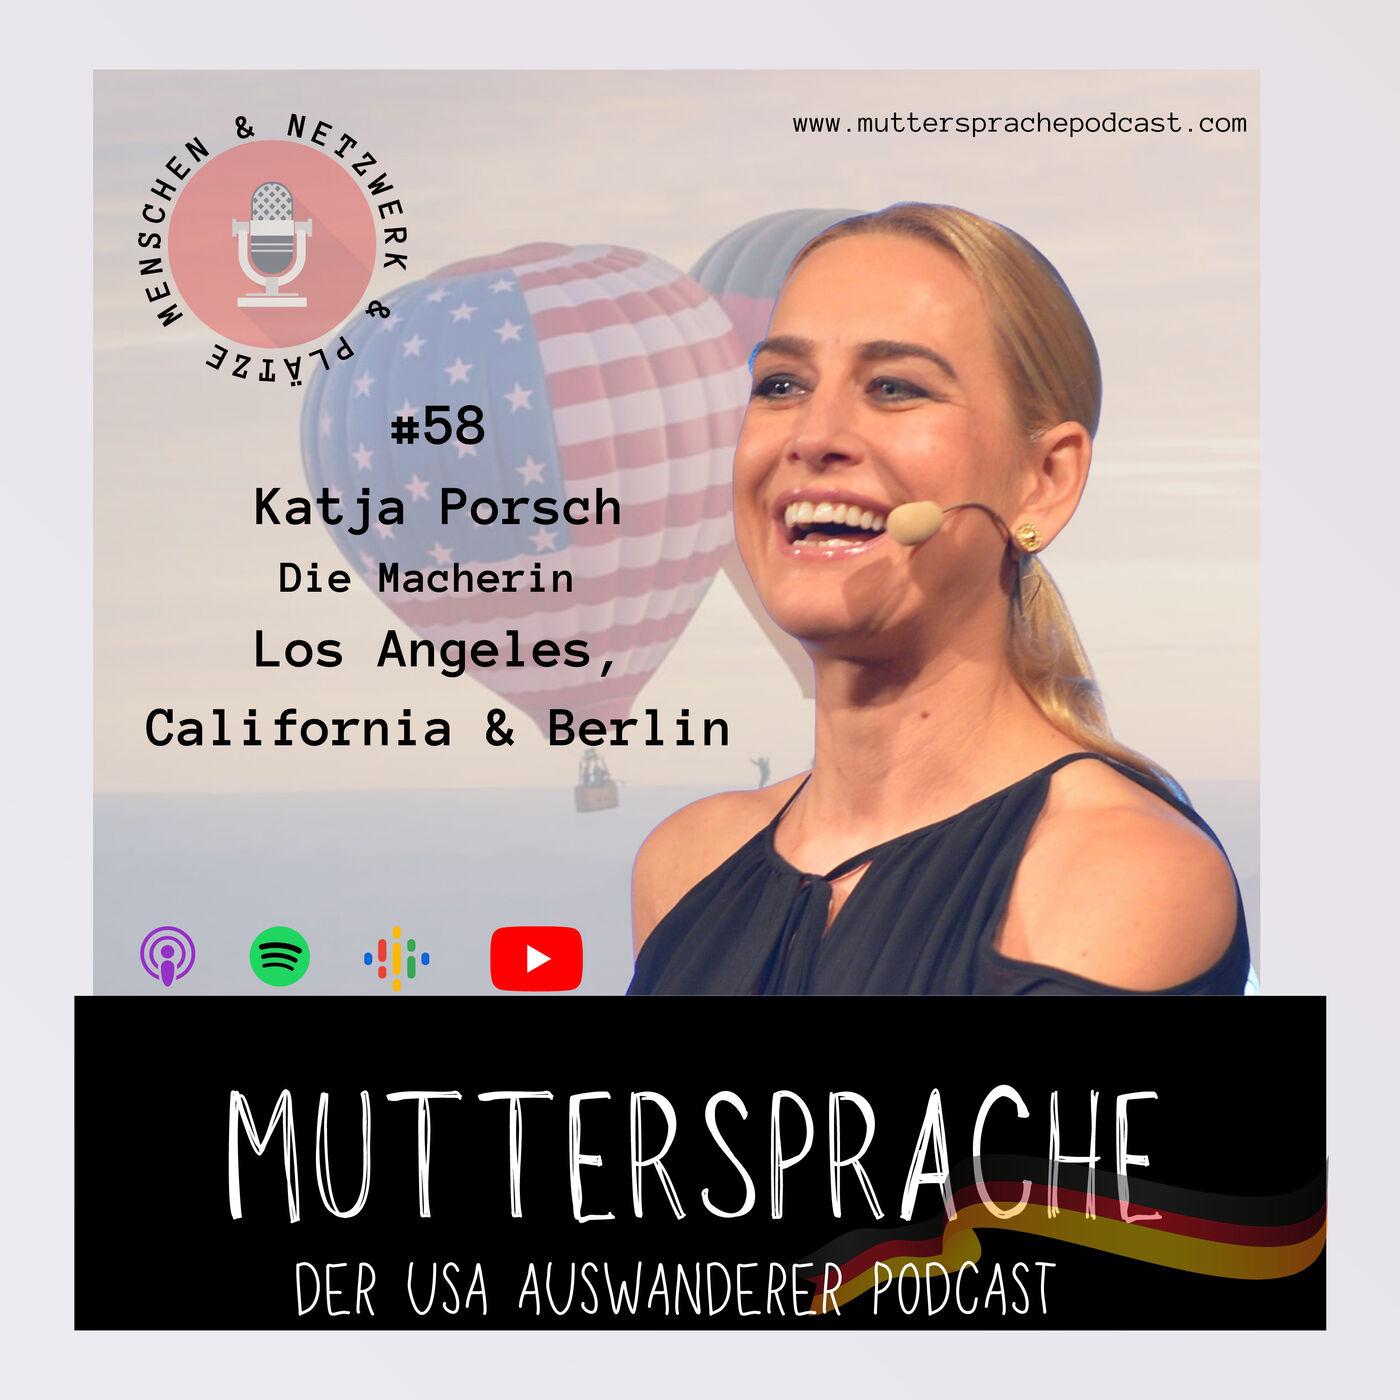 Folge 58: Die Macherin - KATJA PORSCH, LOS ANGELES CALIFORNIA & BERLIN